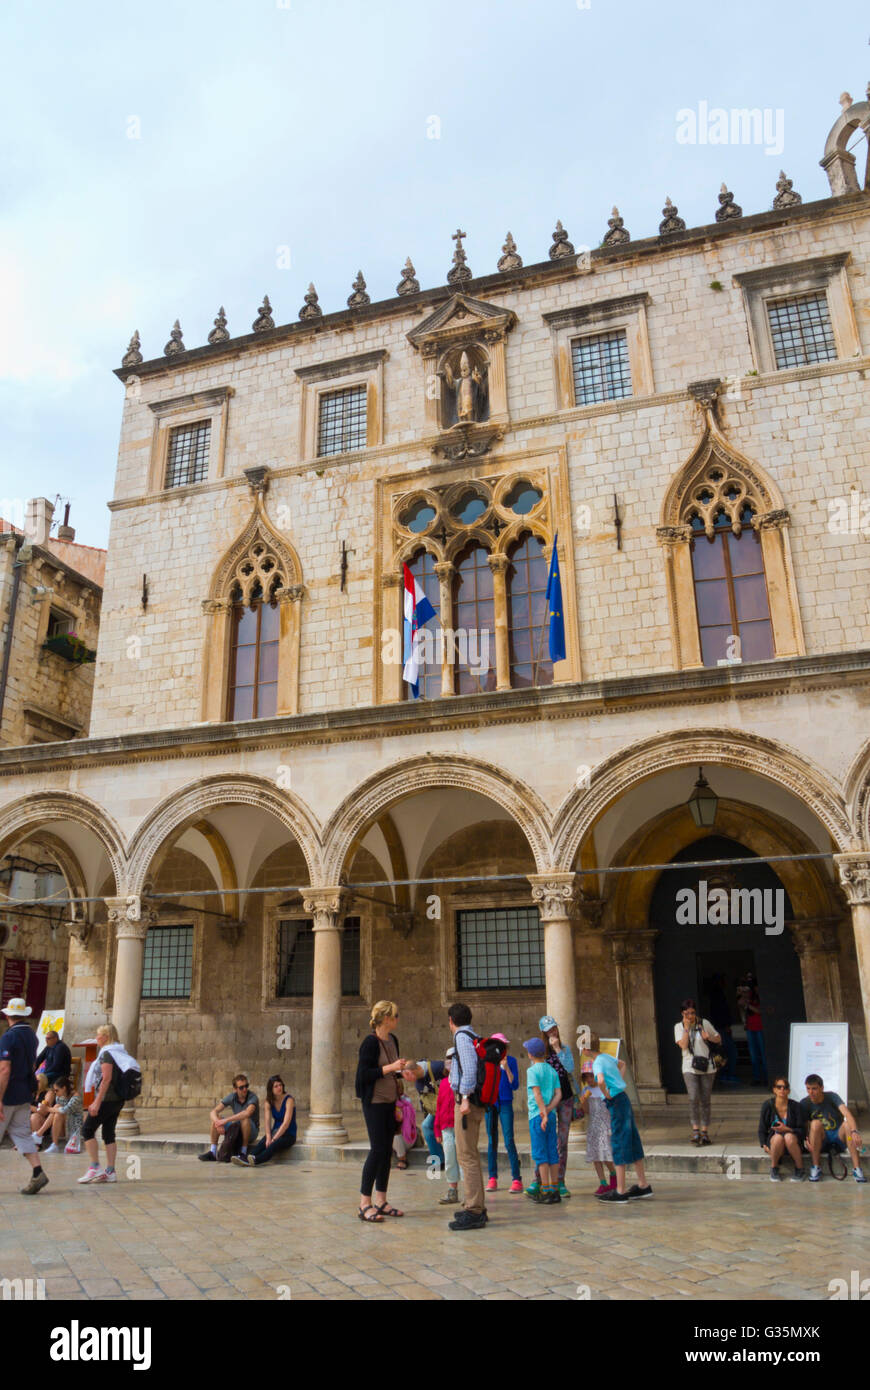 Sponza palace, Luza square, Grad, the old town, Dubrovnik, Dalmatia, Croatia - Stock Image